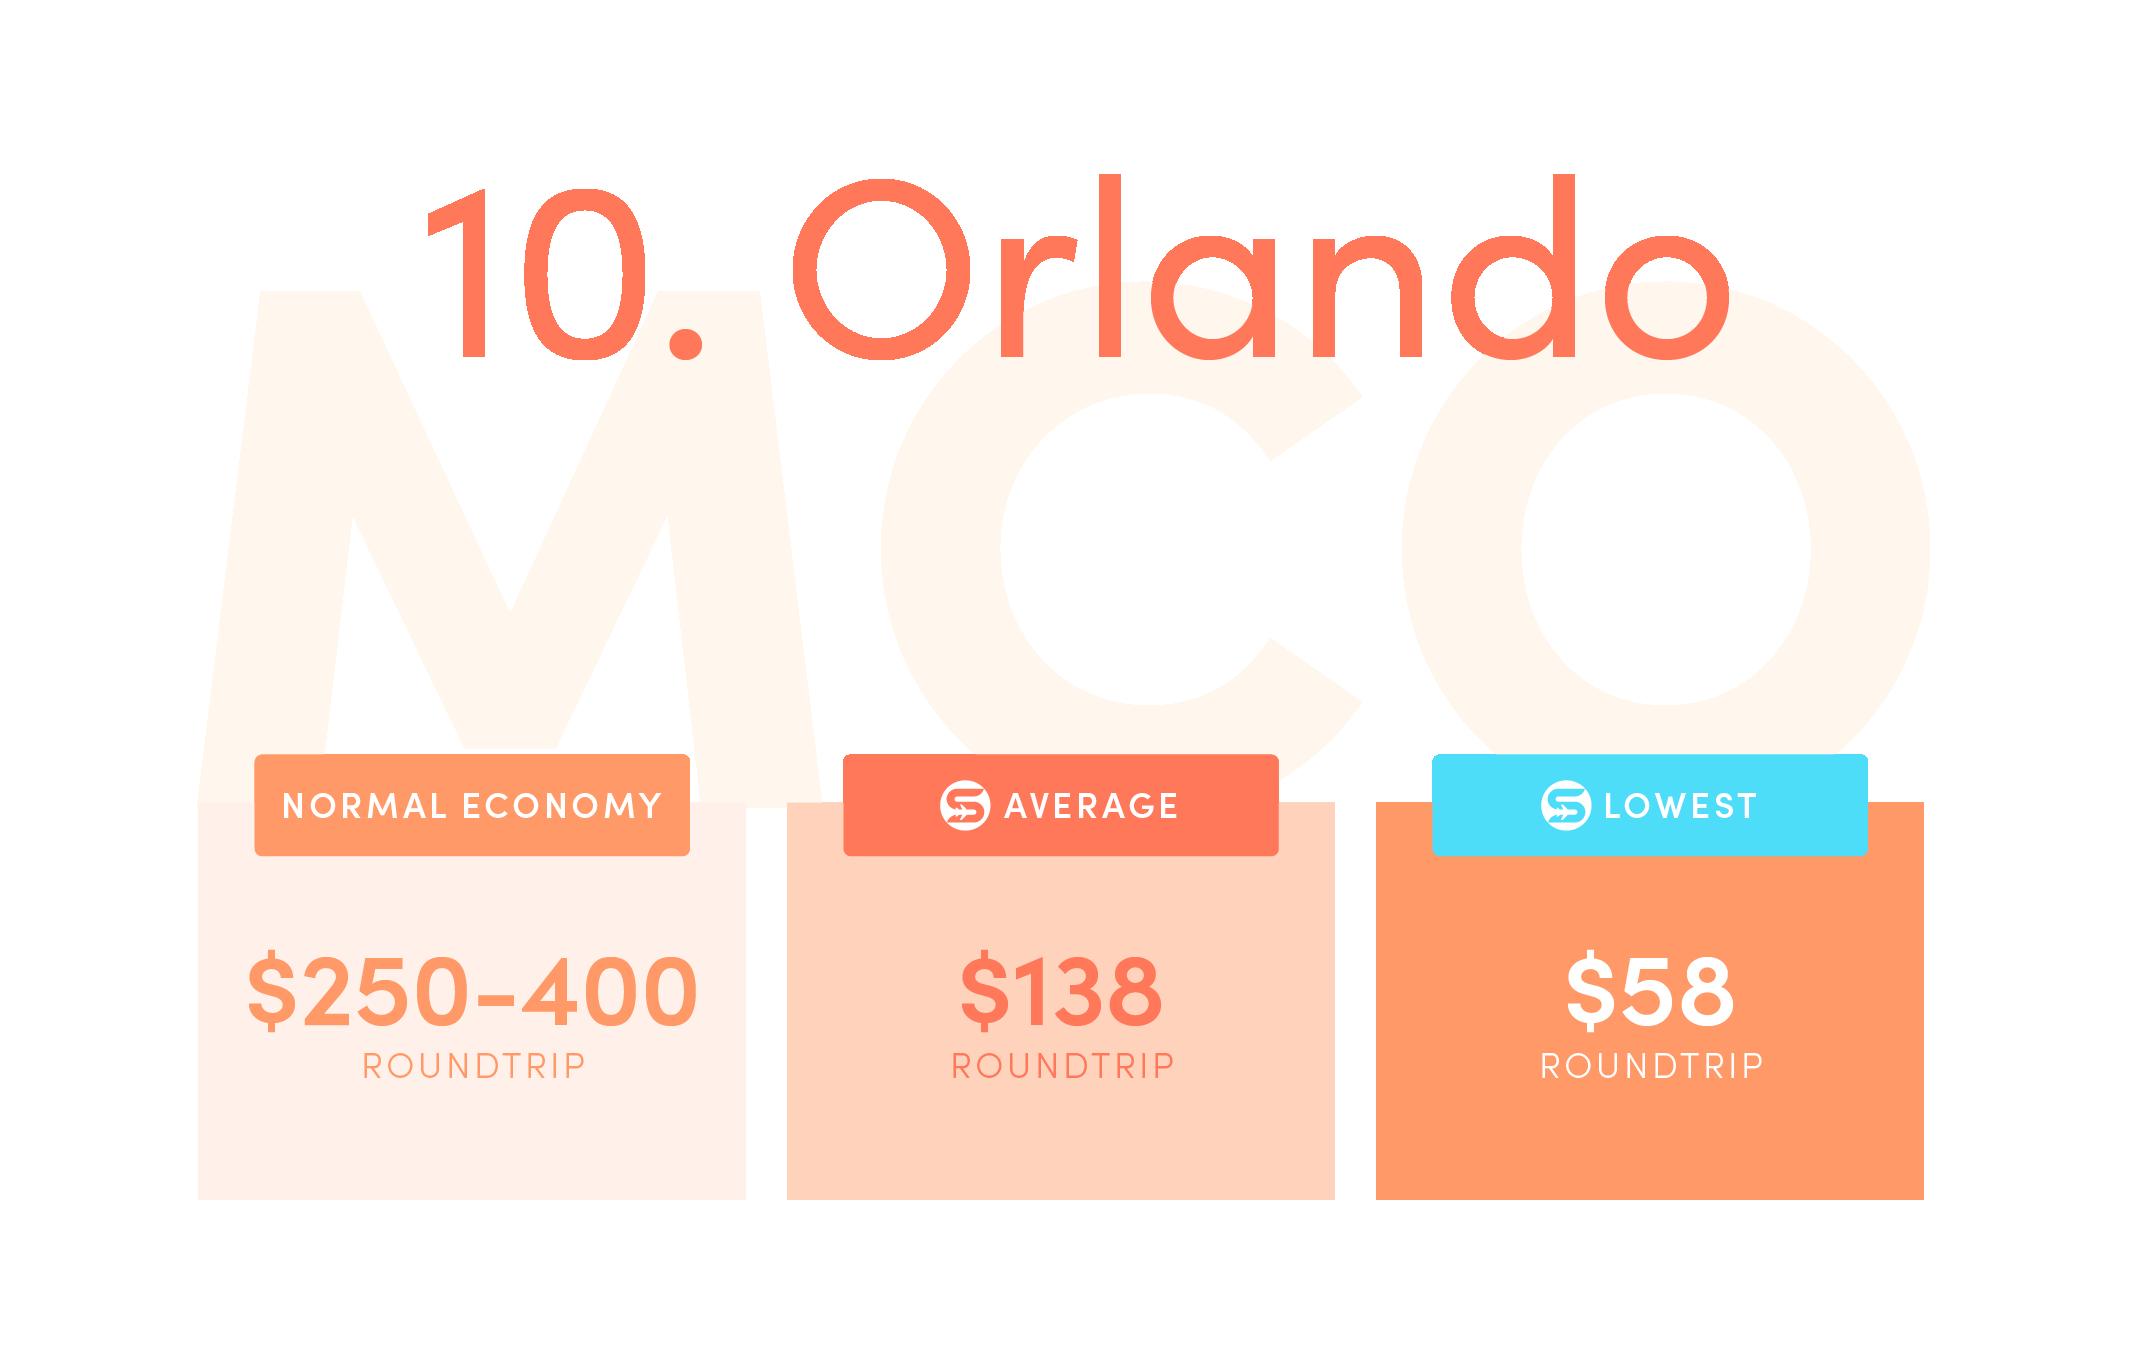 Orlando (MCO).Normal economy price from the US: $250-$400 roundtrip.Average Scott's Cheap Flights economy price: $138 roundtrip.Lowest Scott's Cheap Flights price in 2021: $58 roundtrip.